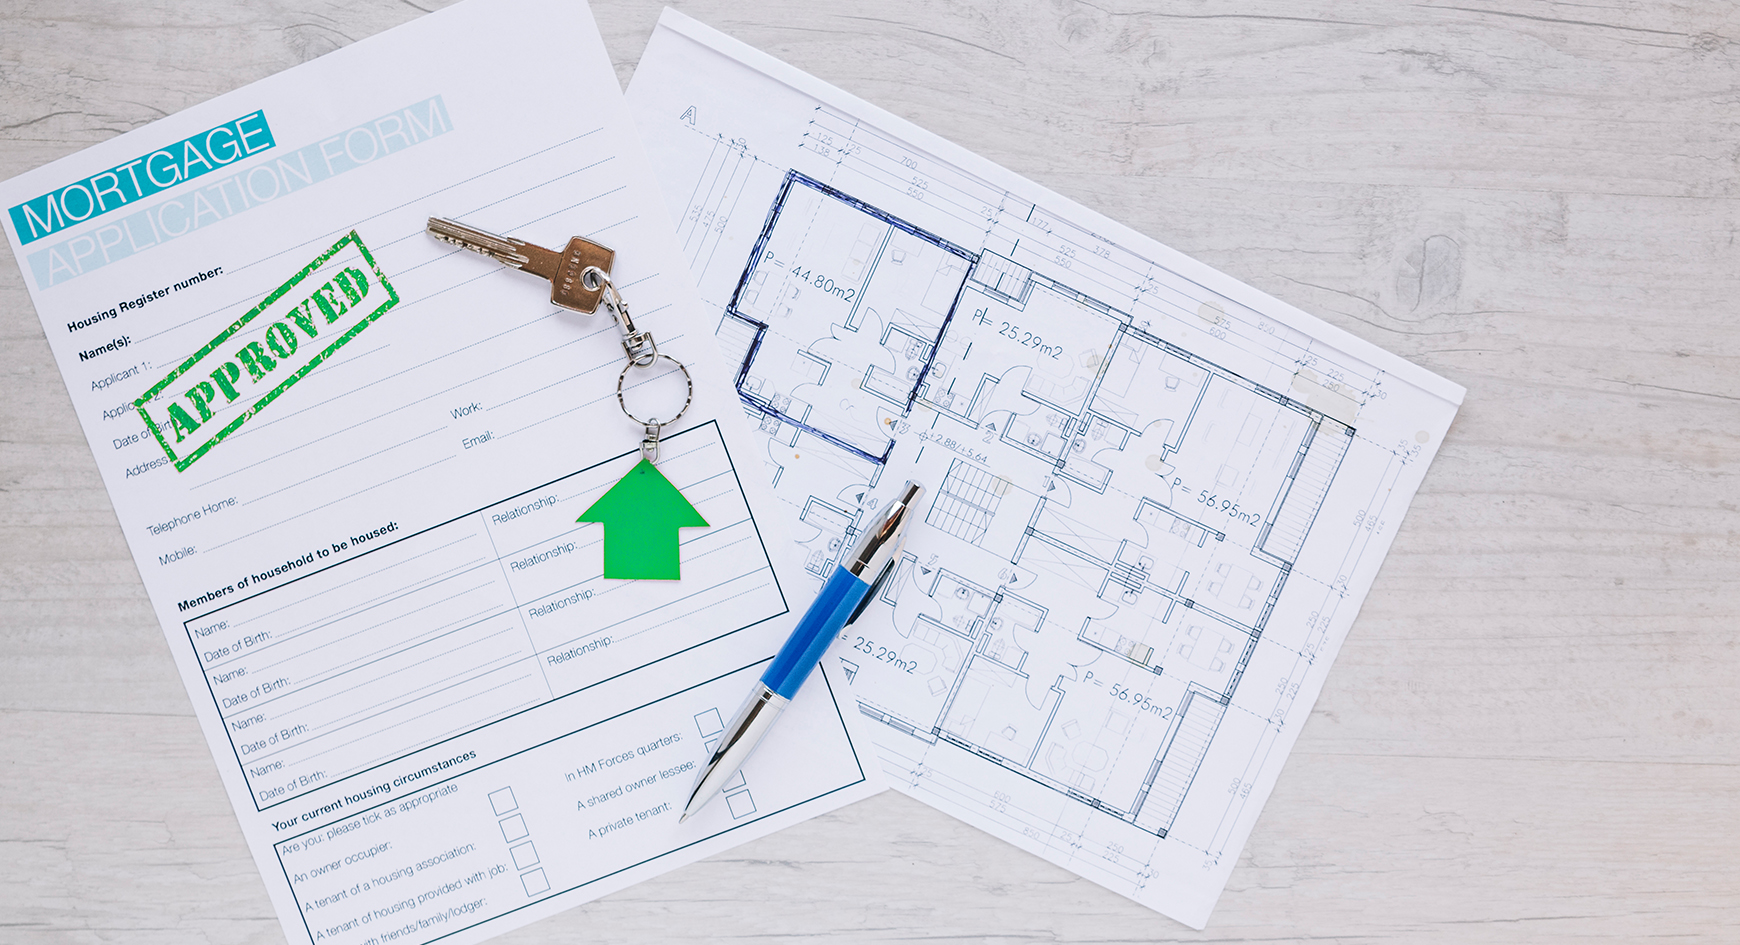 PMAY Housing for All Scheme Jaipur, Rajasthan 2019-2022